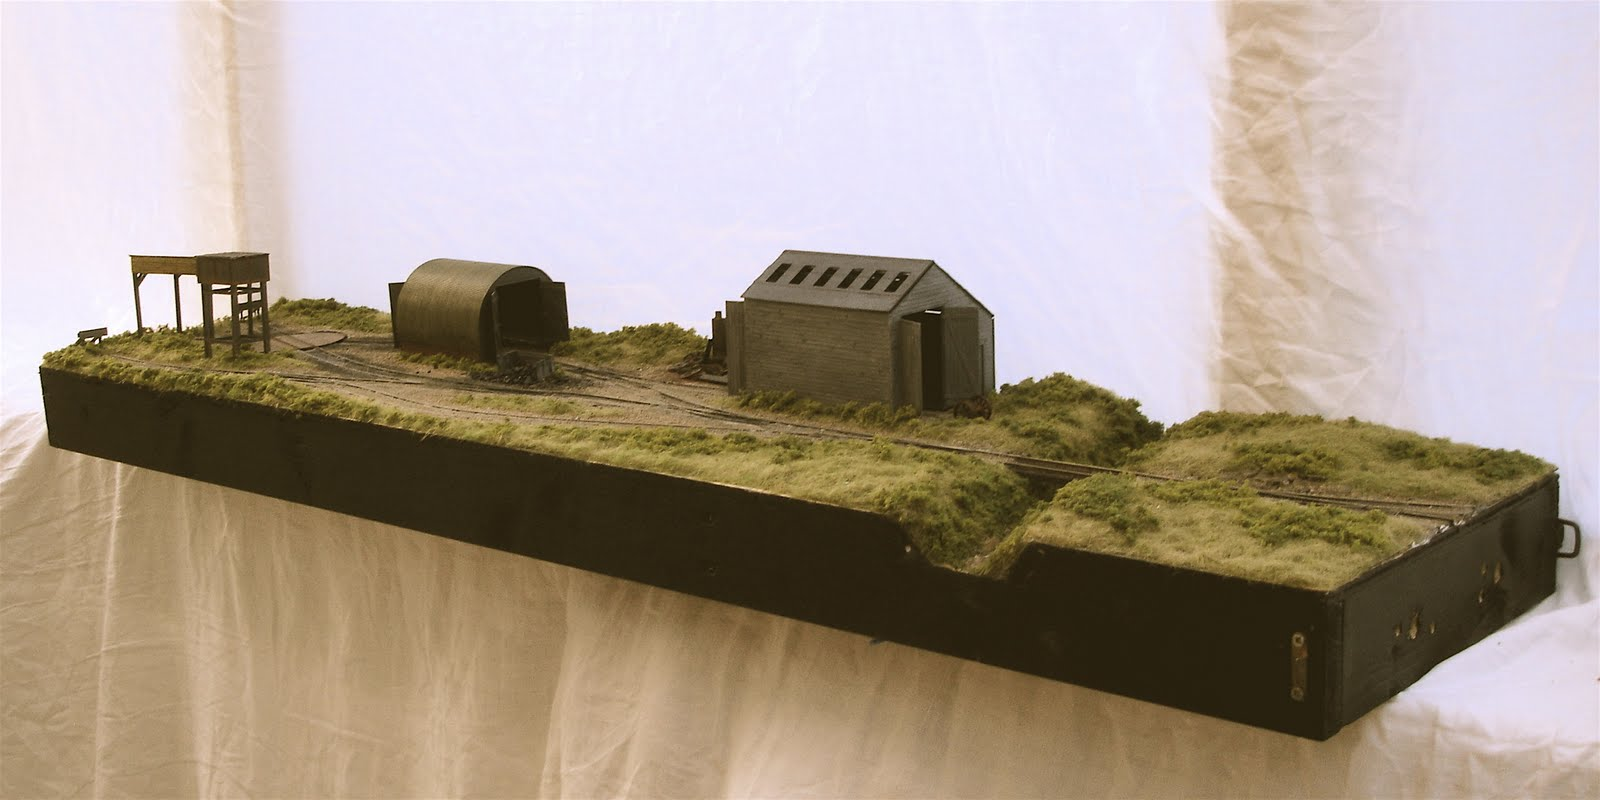 Tims Models Hockenhull Platts Railway